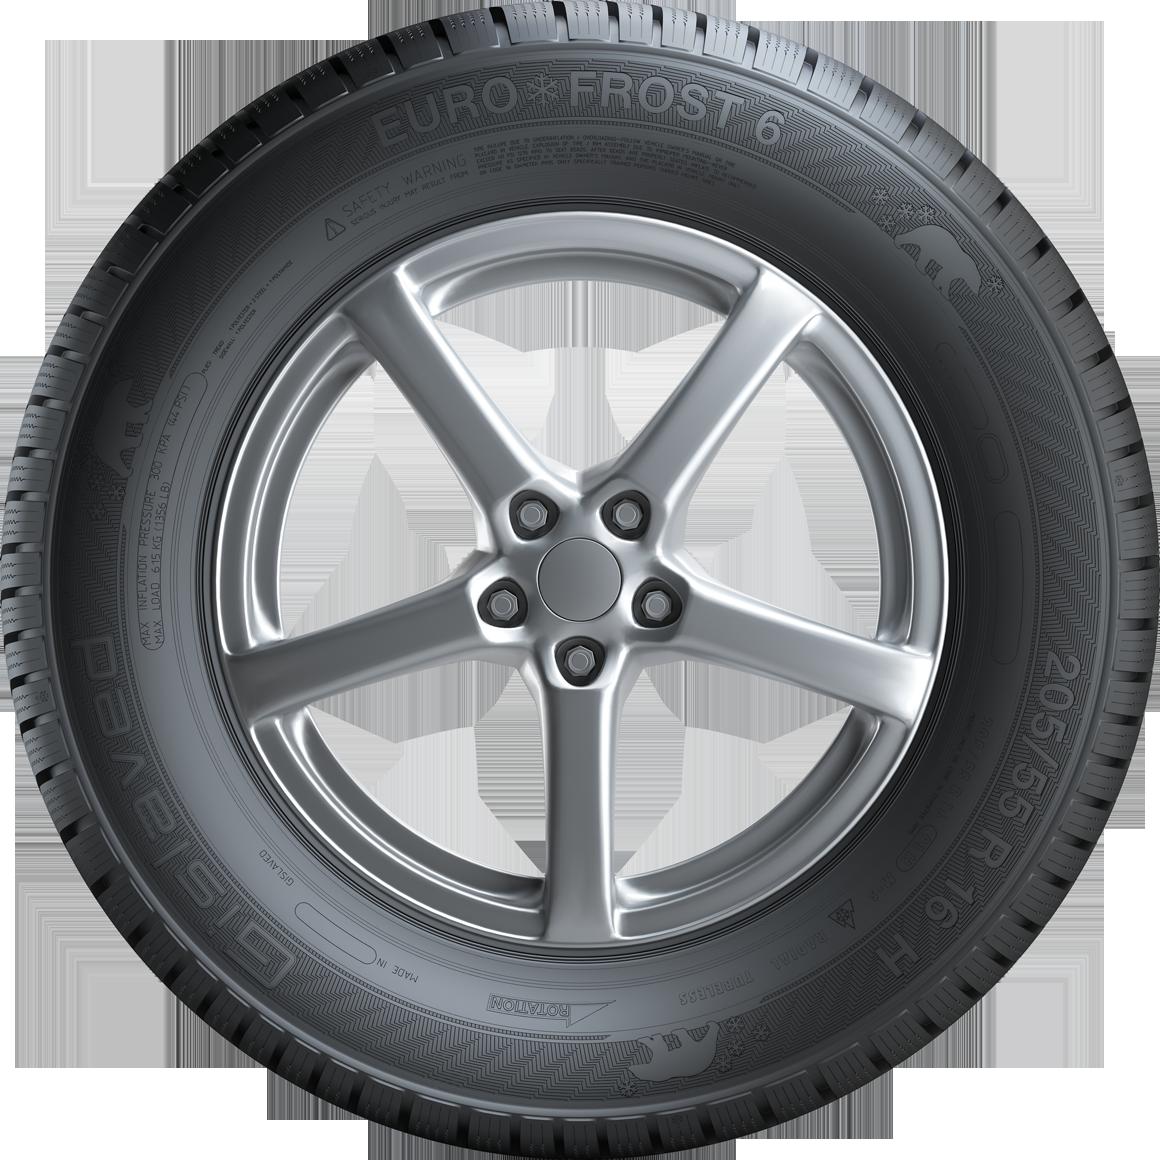 Neumático GISLAVED EURO*FROST6 165/65R14 79 T